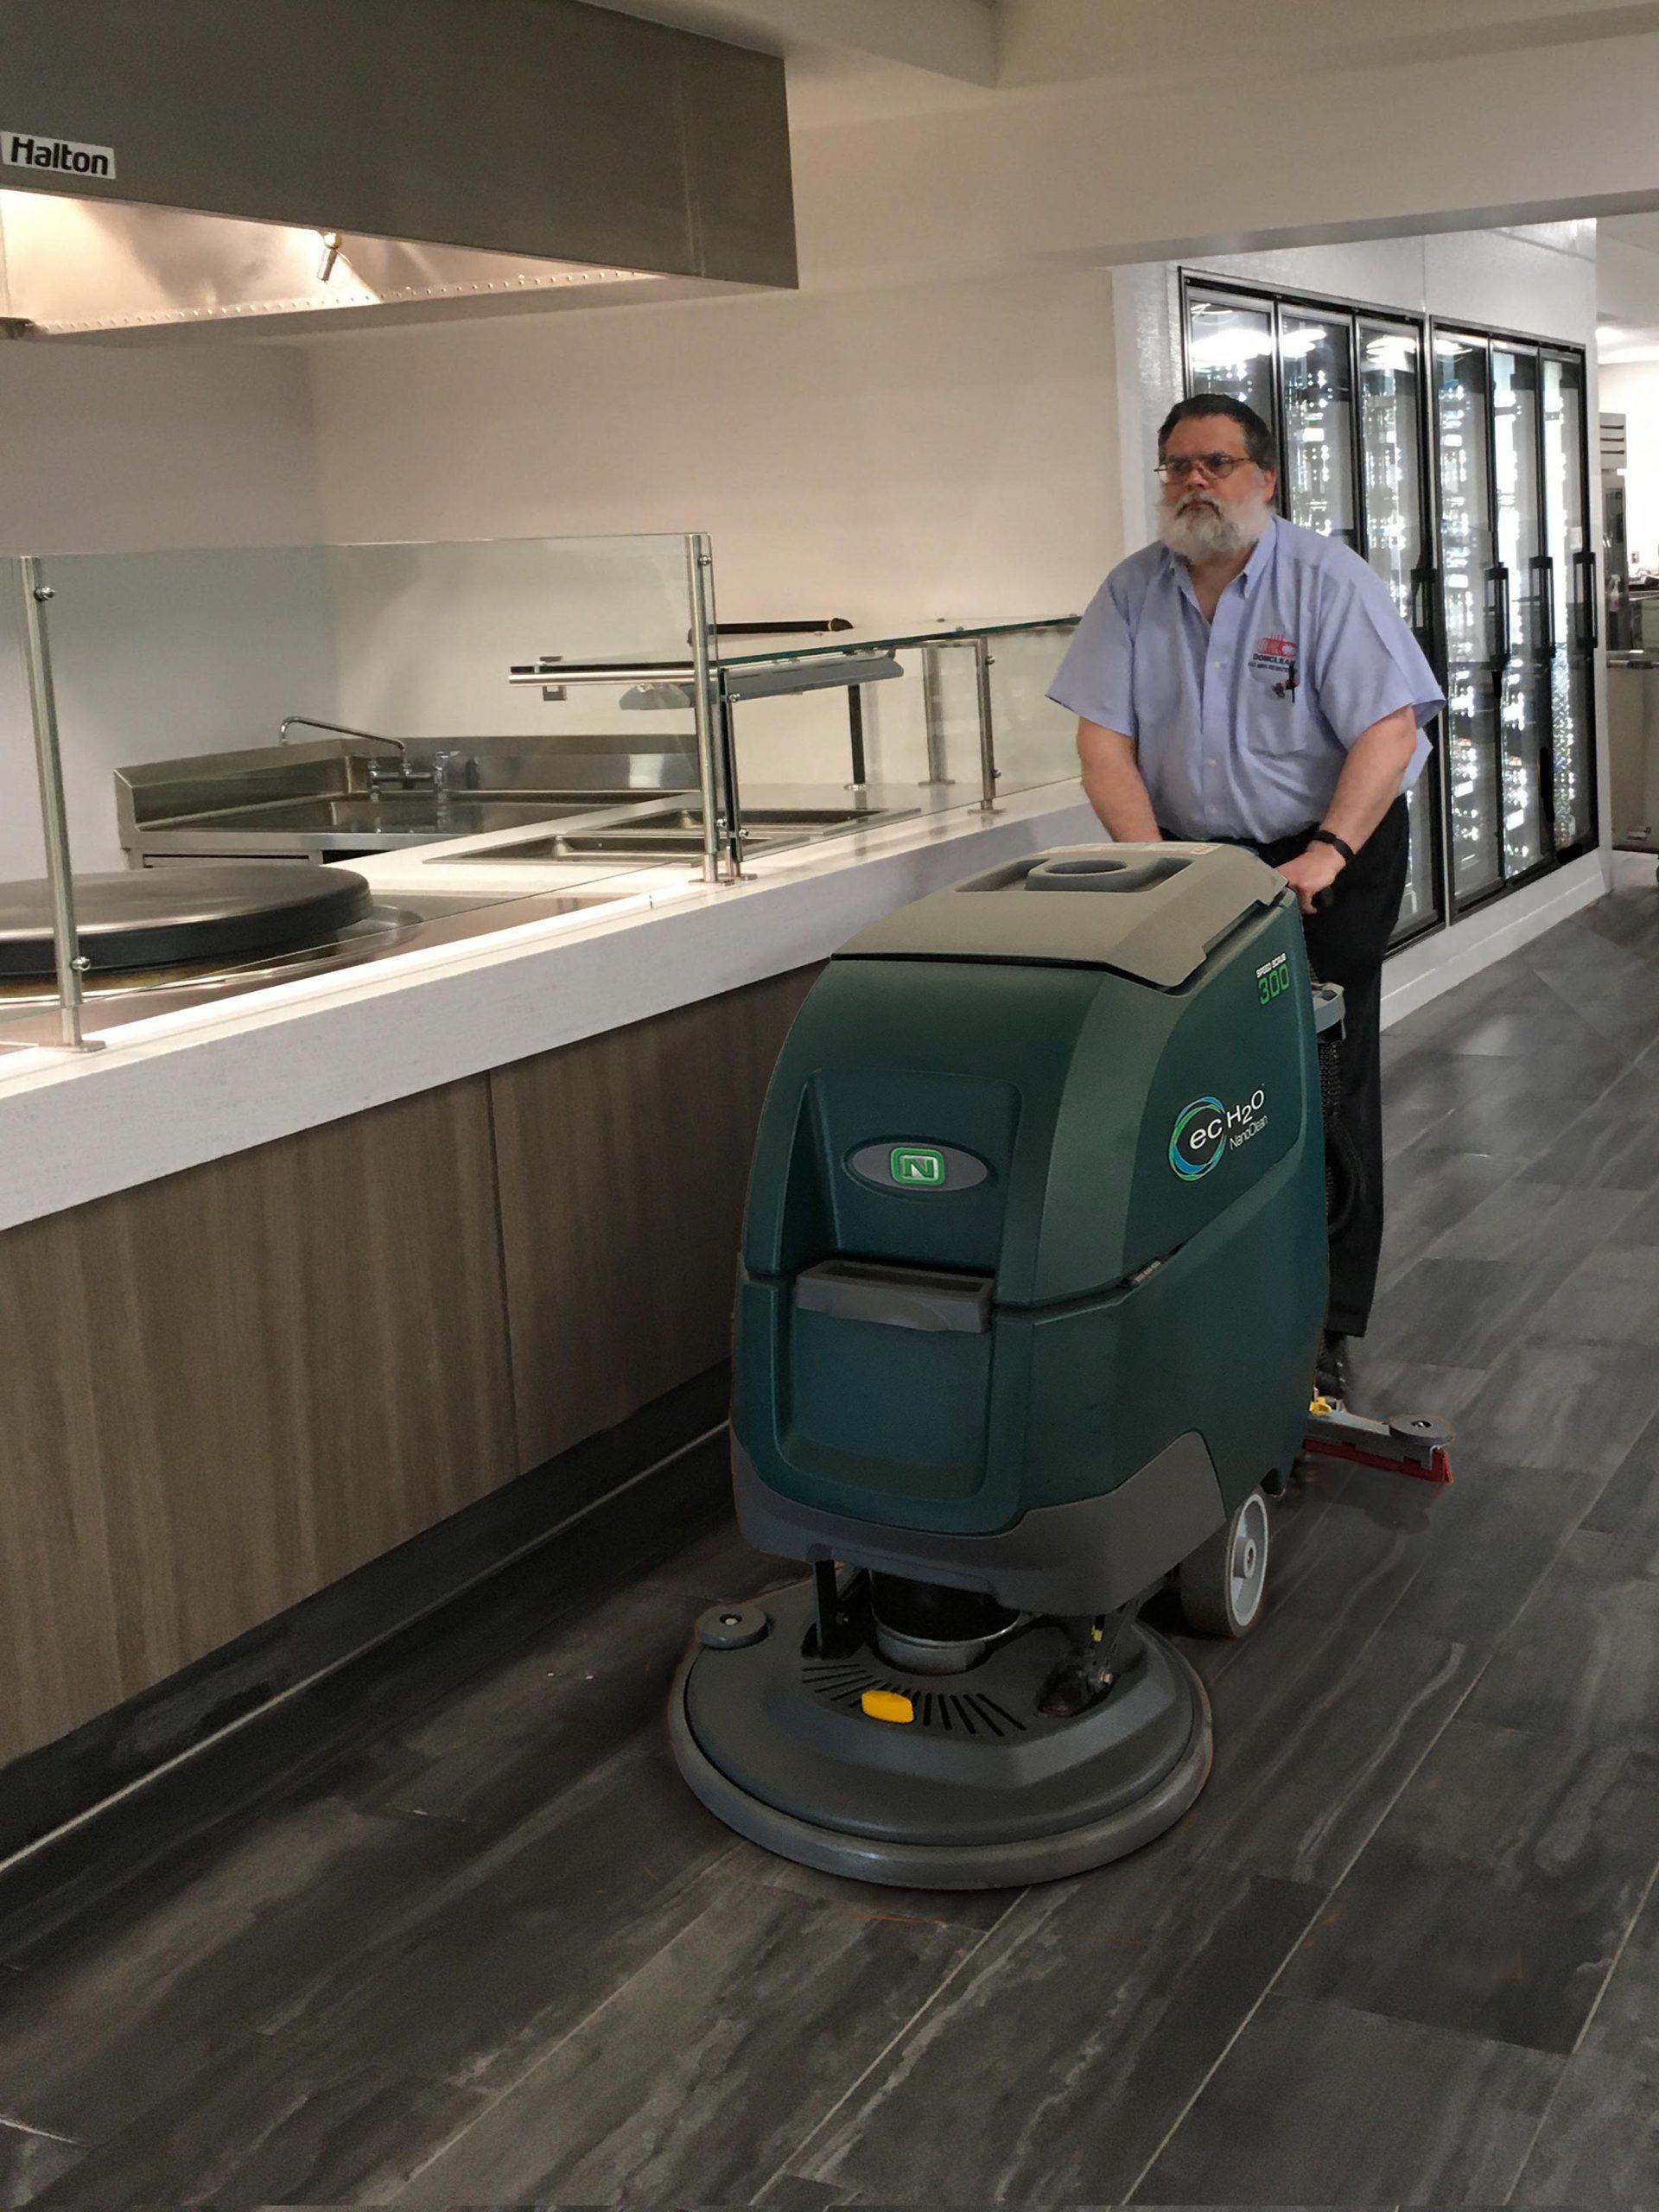 Man pushing floor cleaner through office hallway